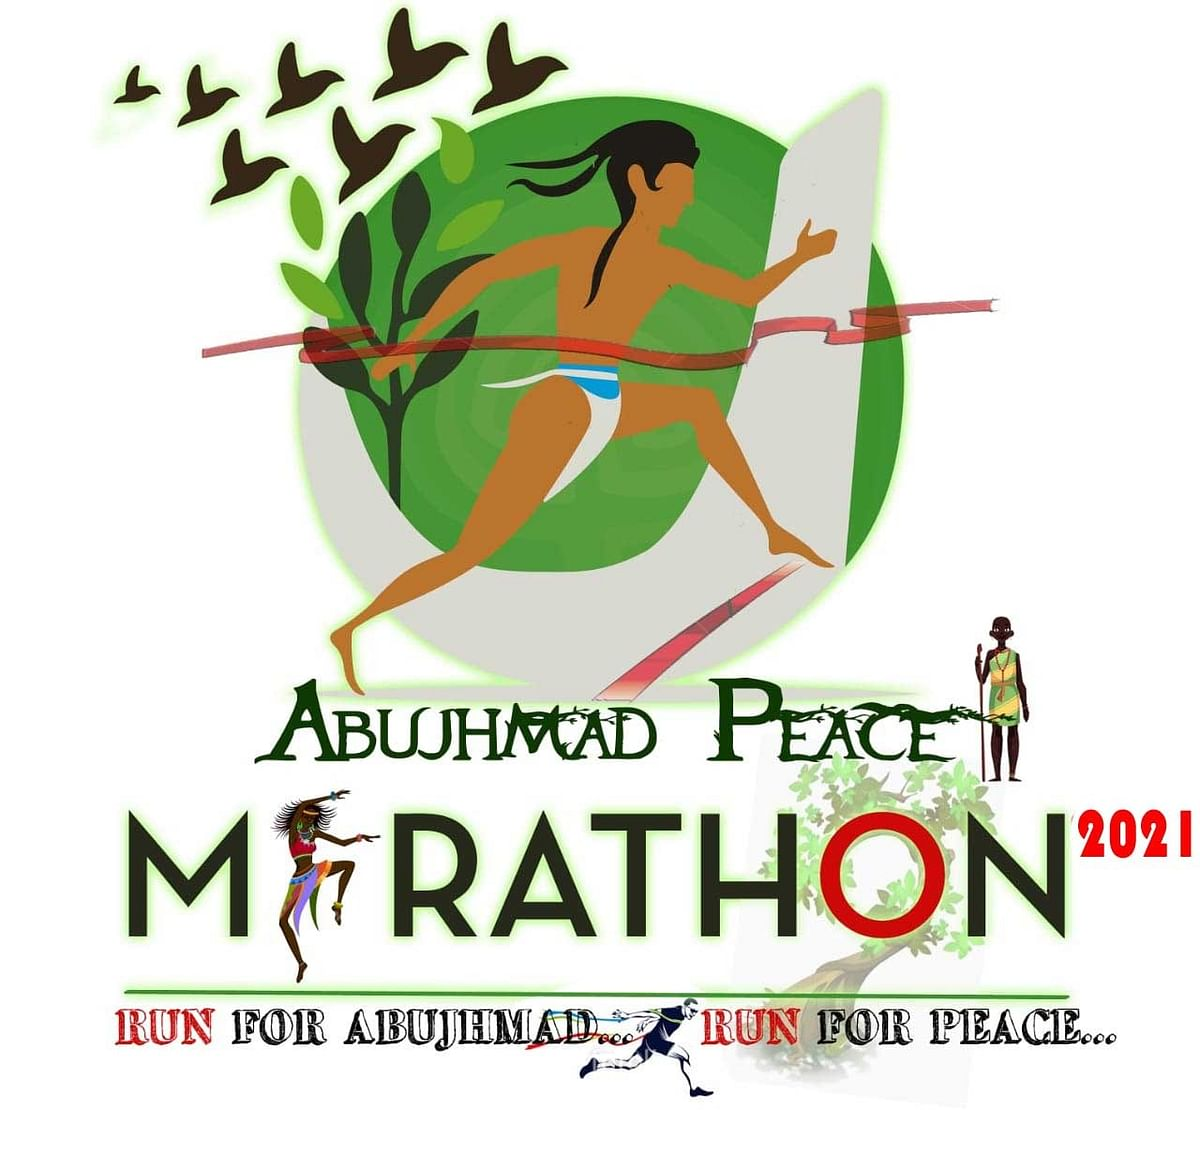 raipur-abujhmad-peace-half-marathon-2021-more-than-seven-thousand-participants-registered